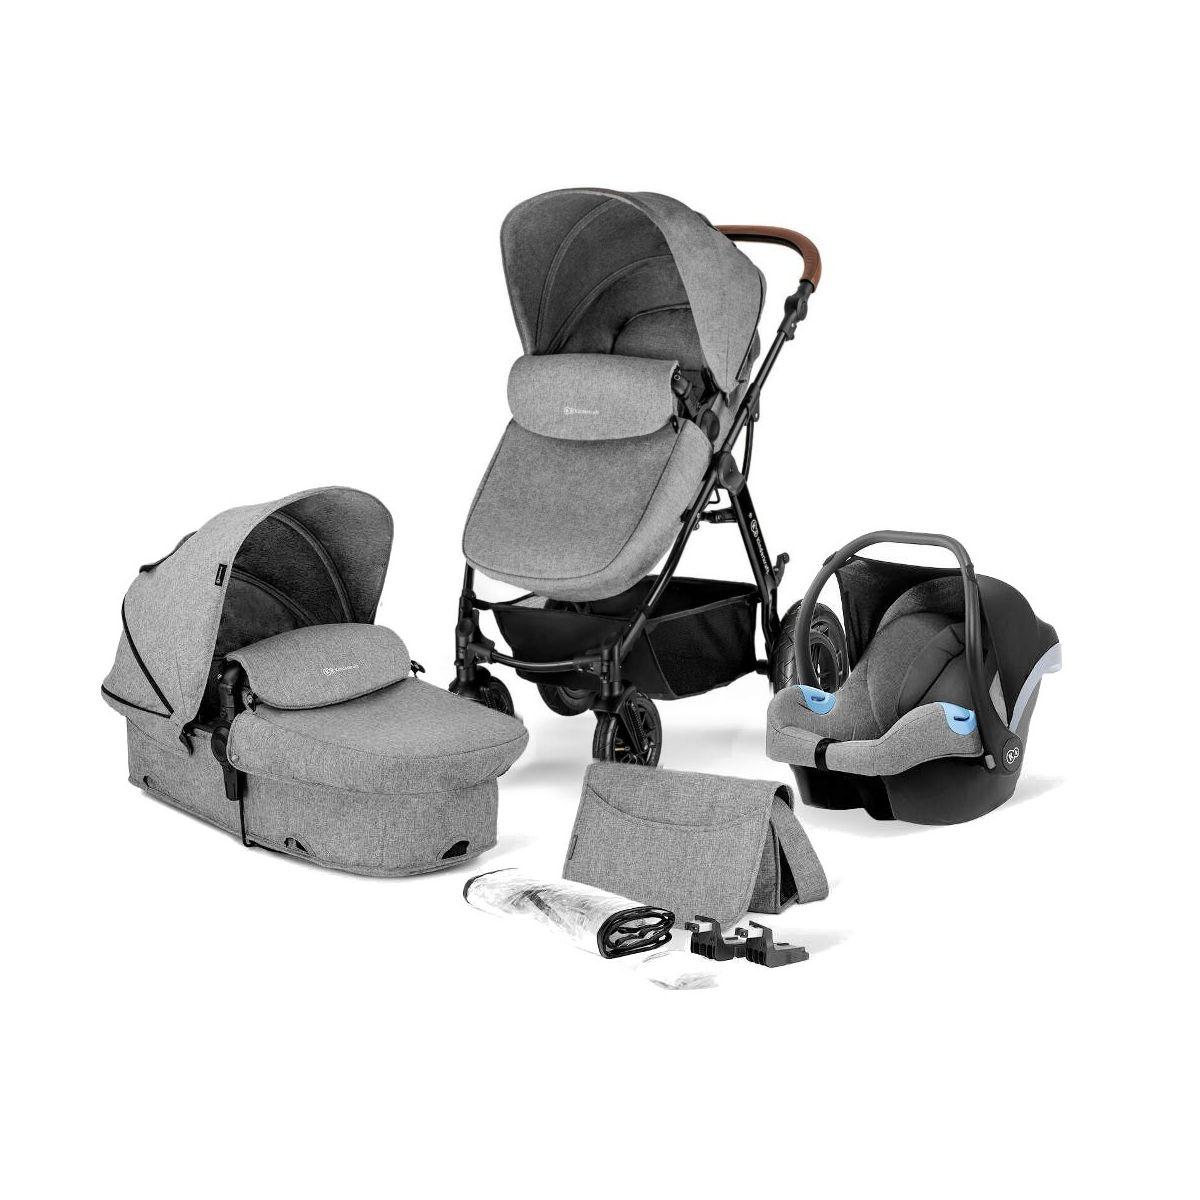 Kinderkraft Moov 3in1 Travel System-Grey Melange